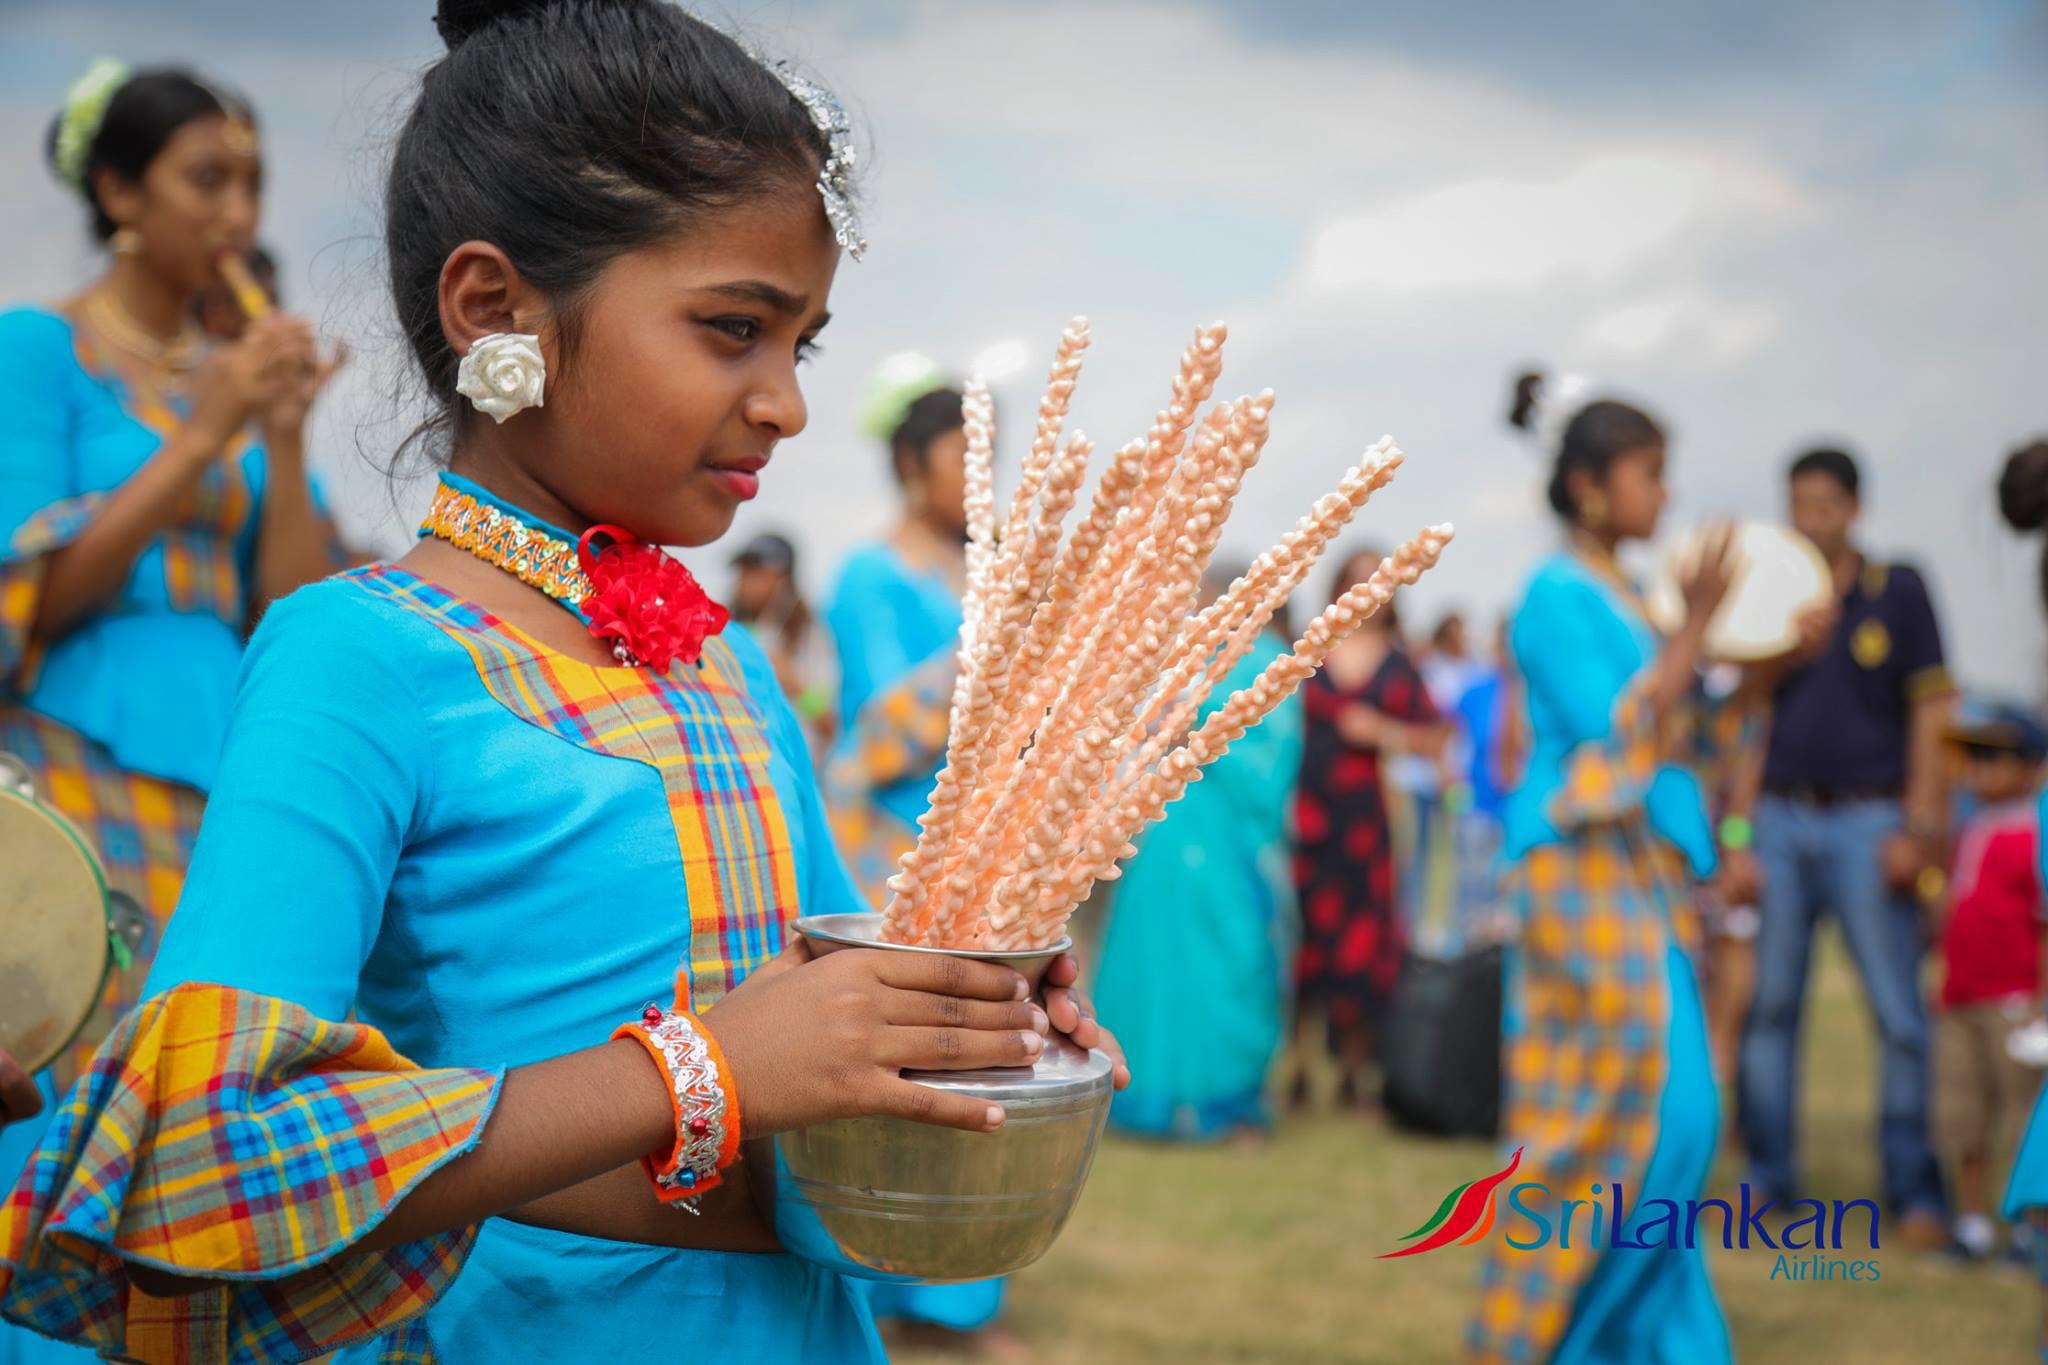 Sri-Lankan-airlines-cricket-festival-london-2017-natalia-smith--photography-12.jpg